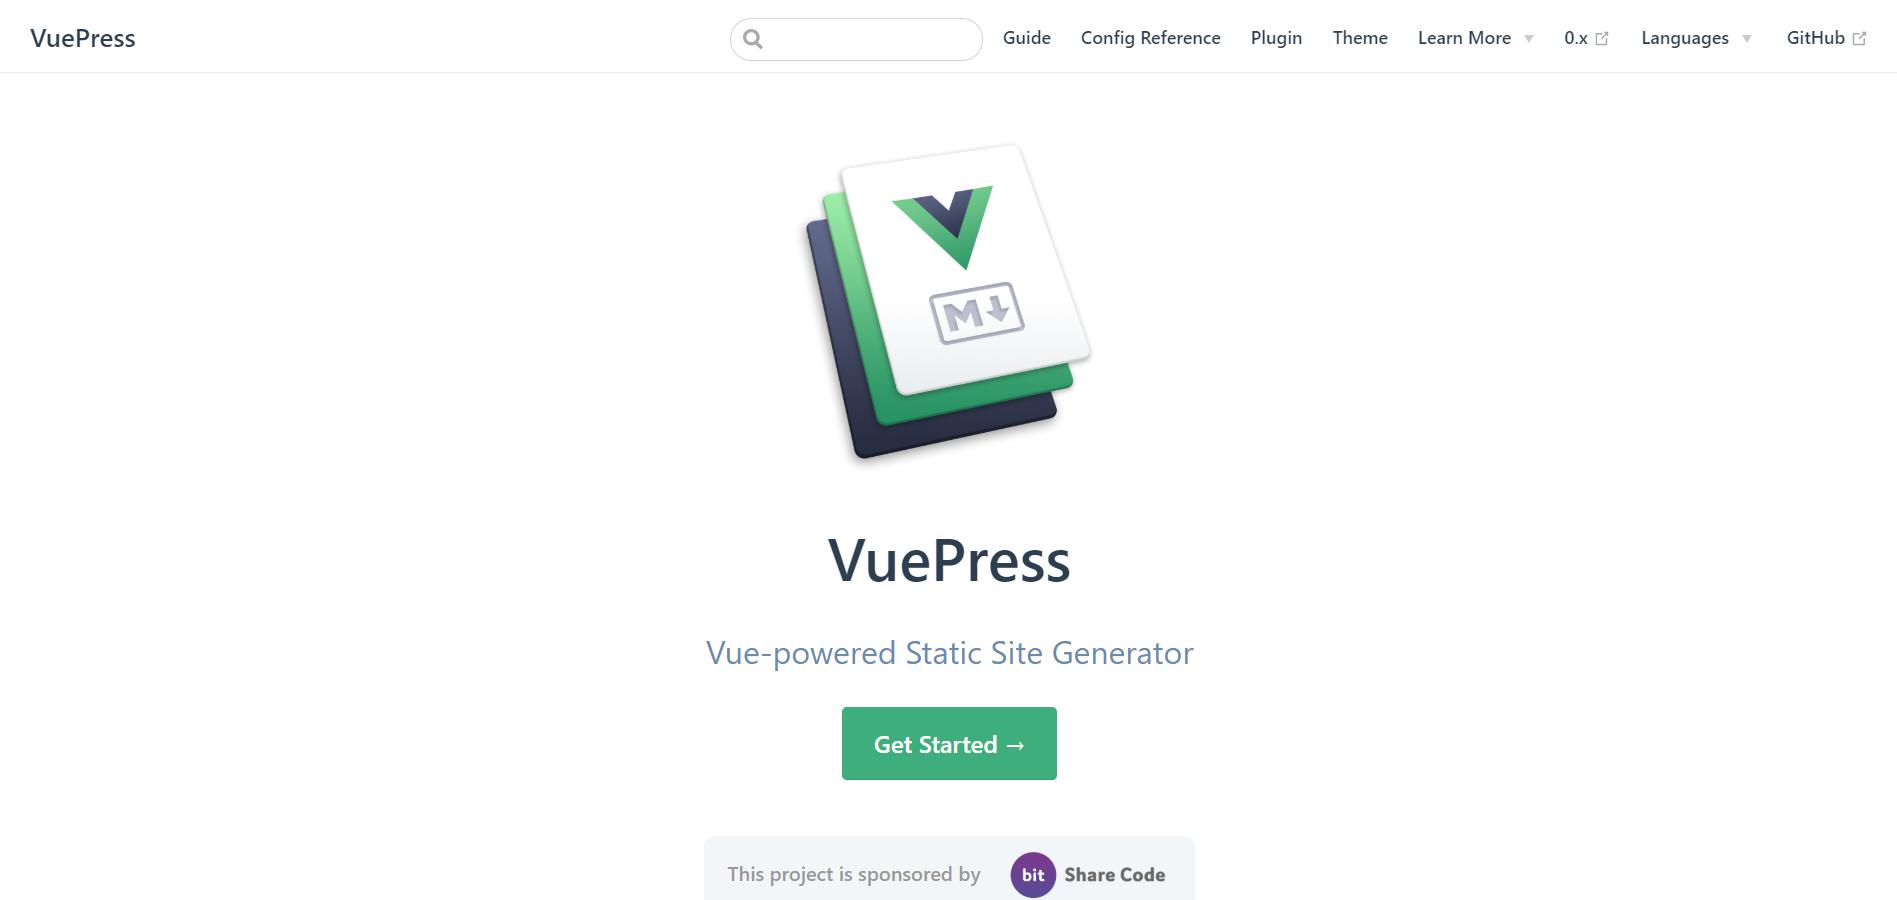 VuePress landing page